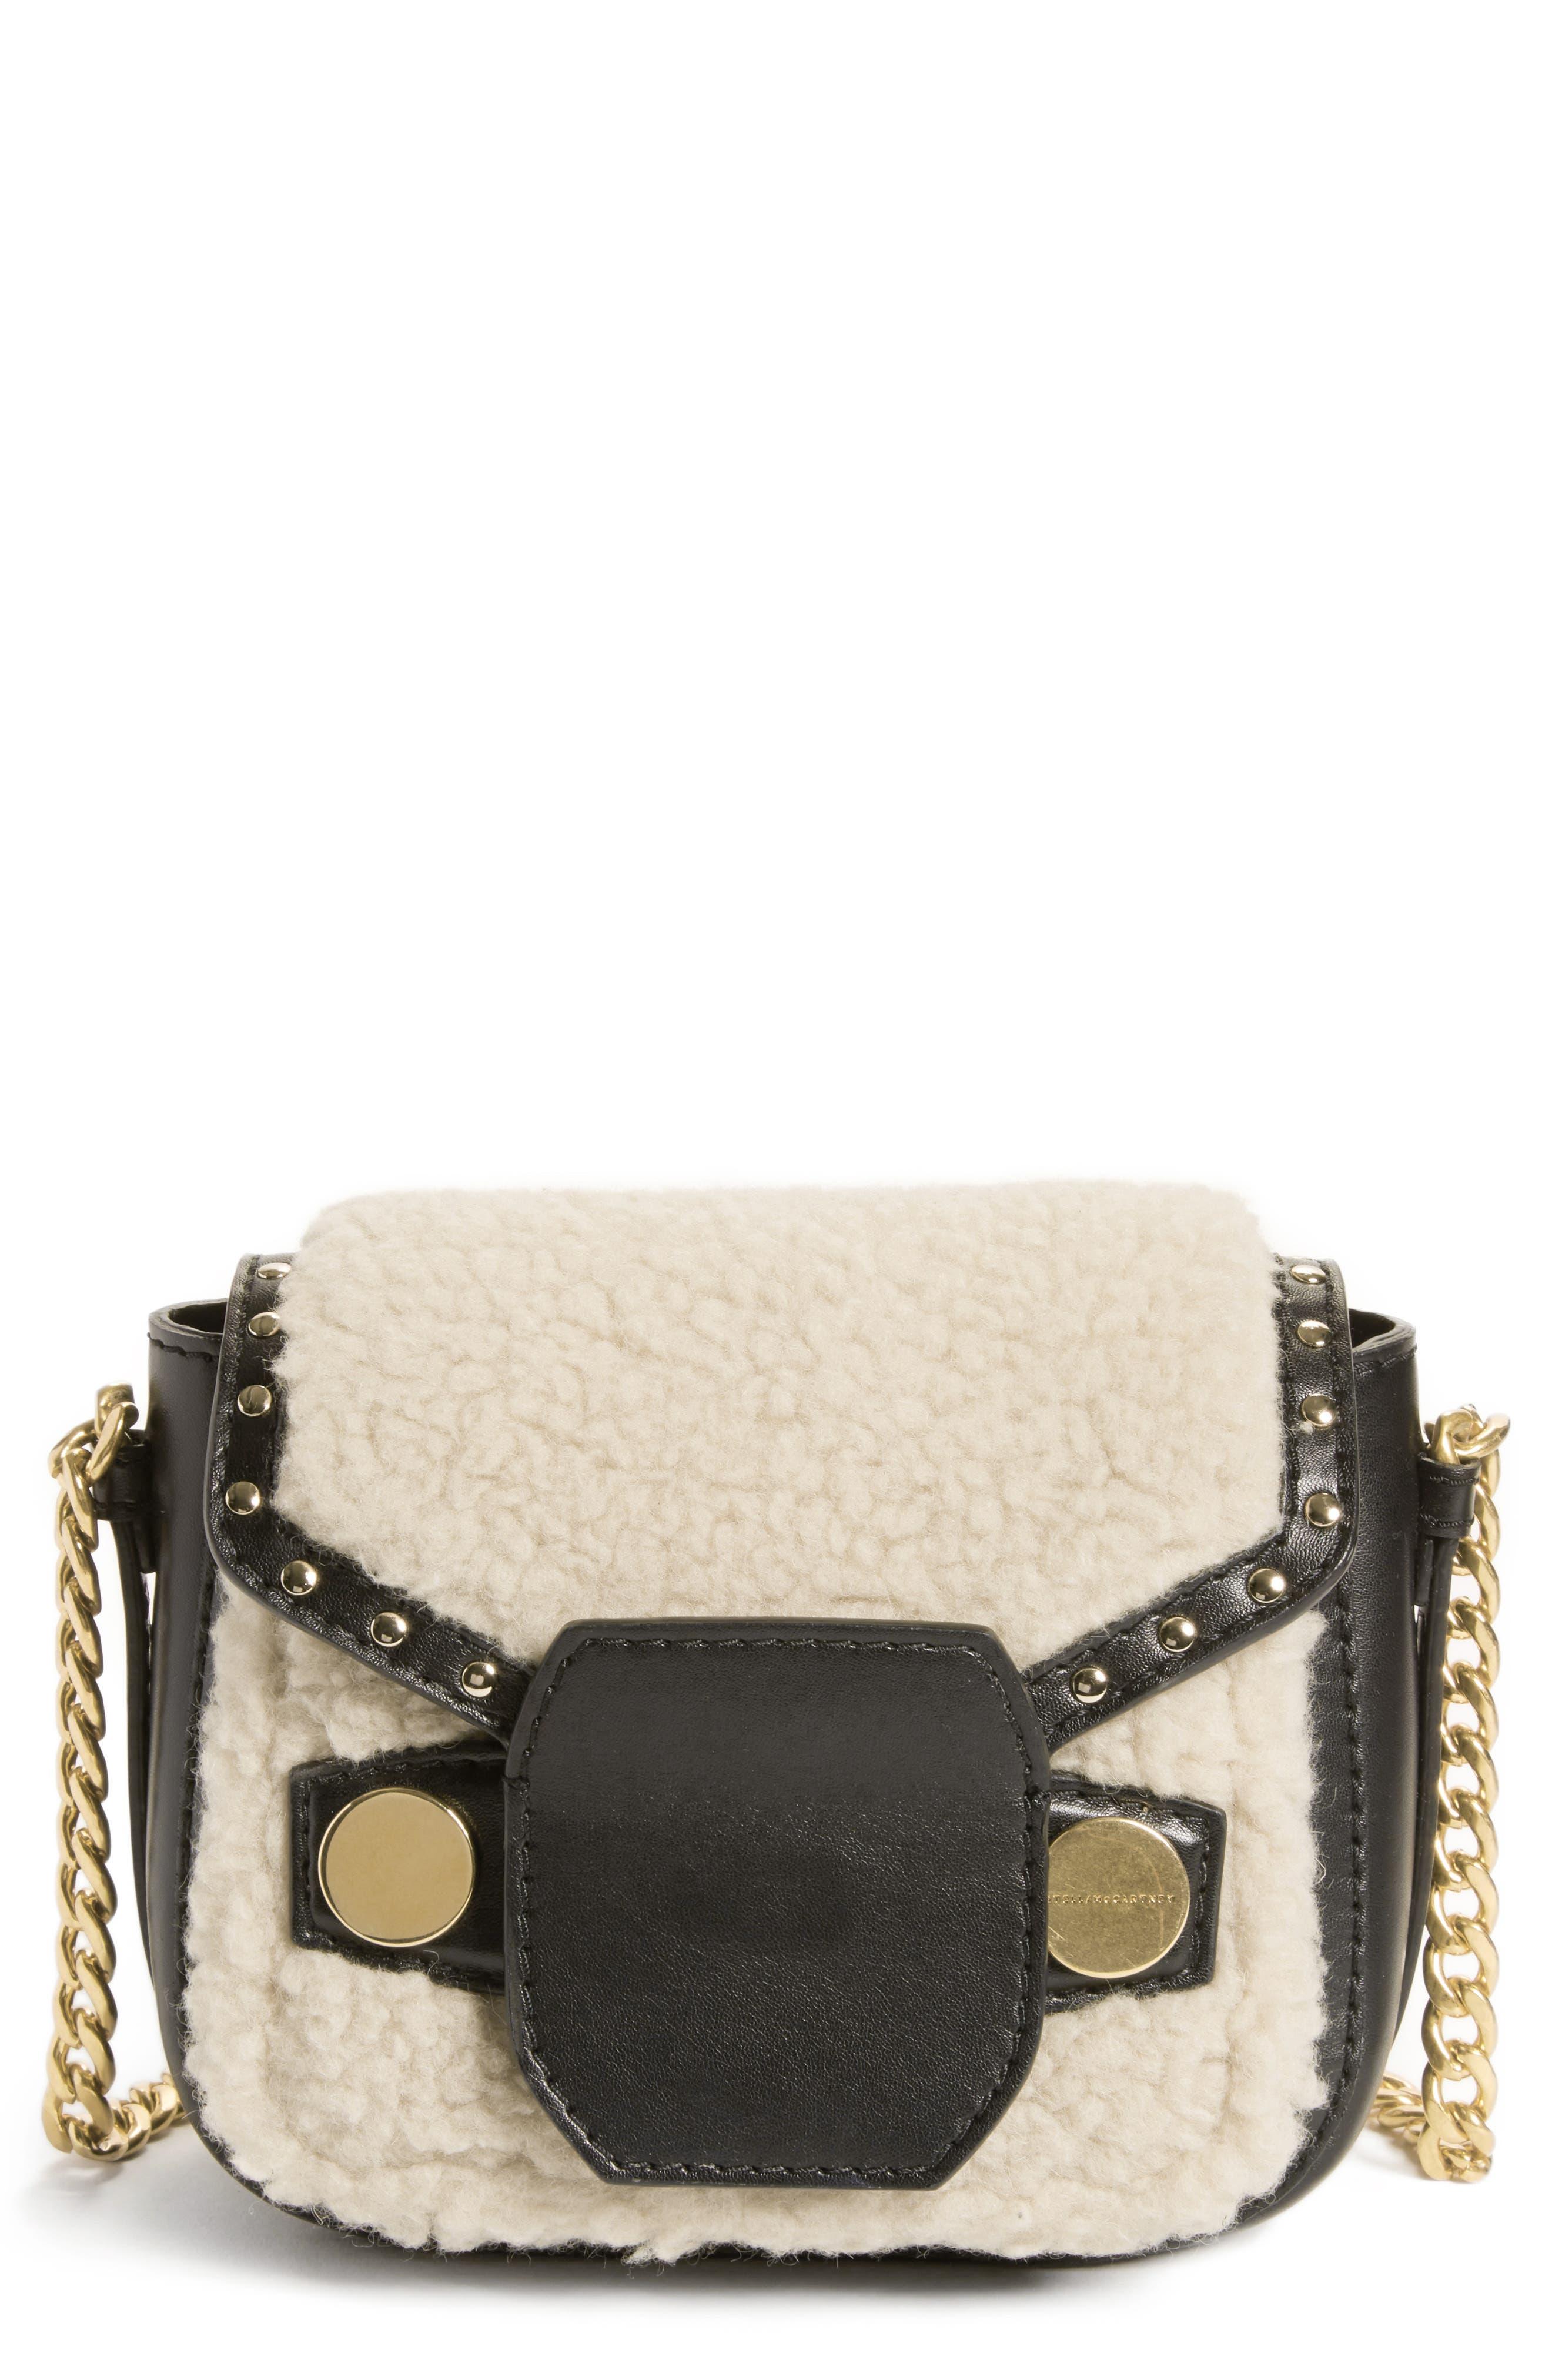 Stella McCartney Faux Shearling & Leather Crossbody Bag